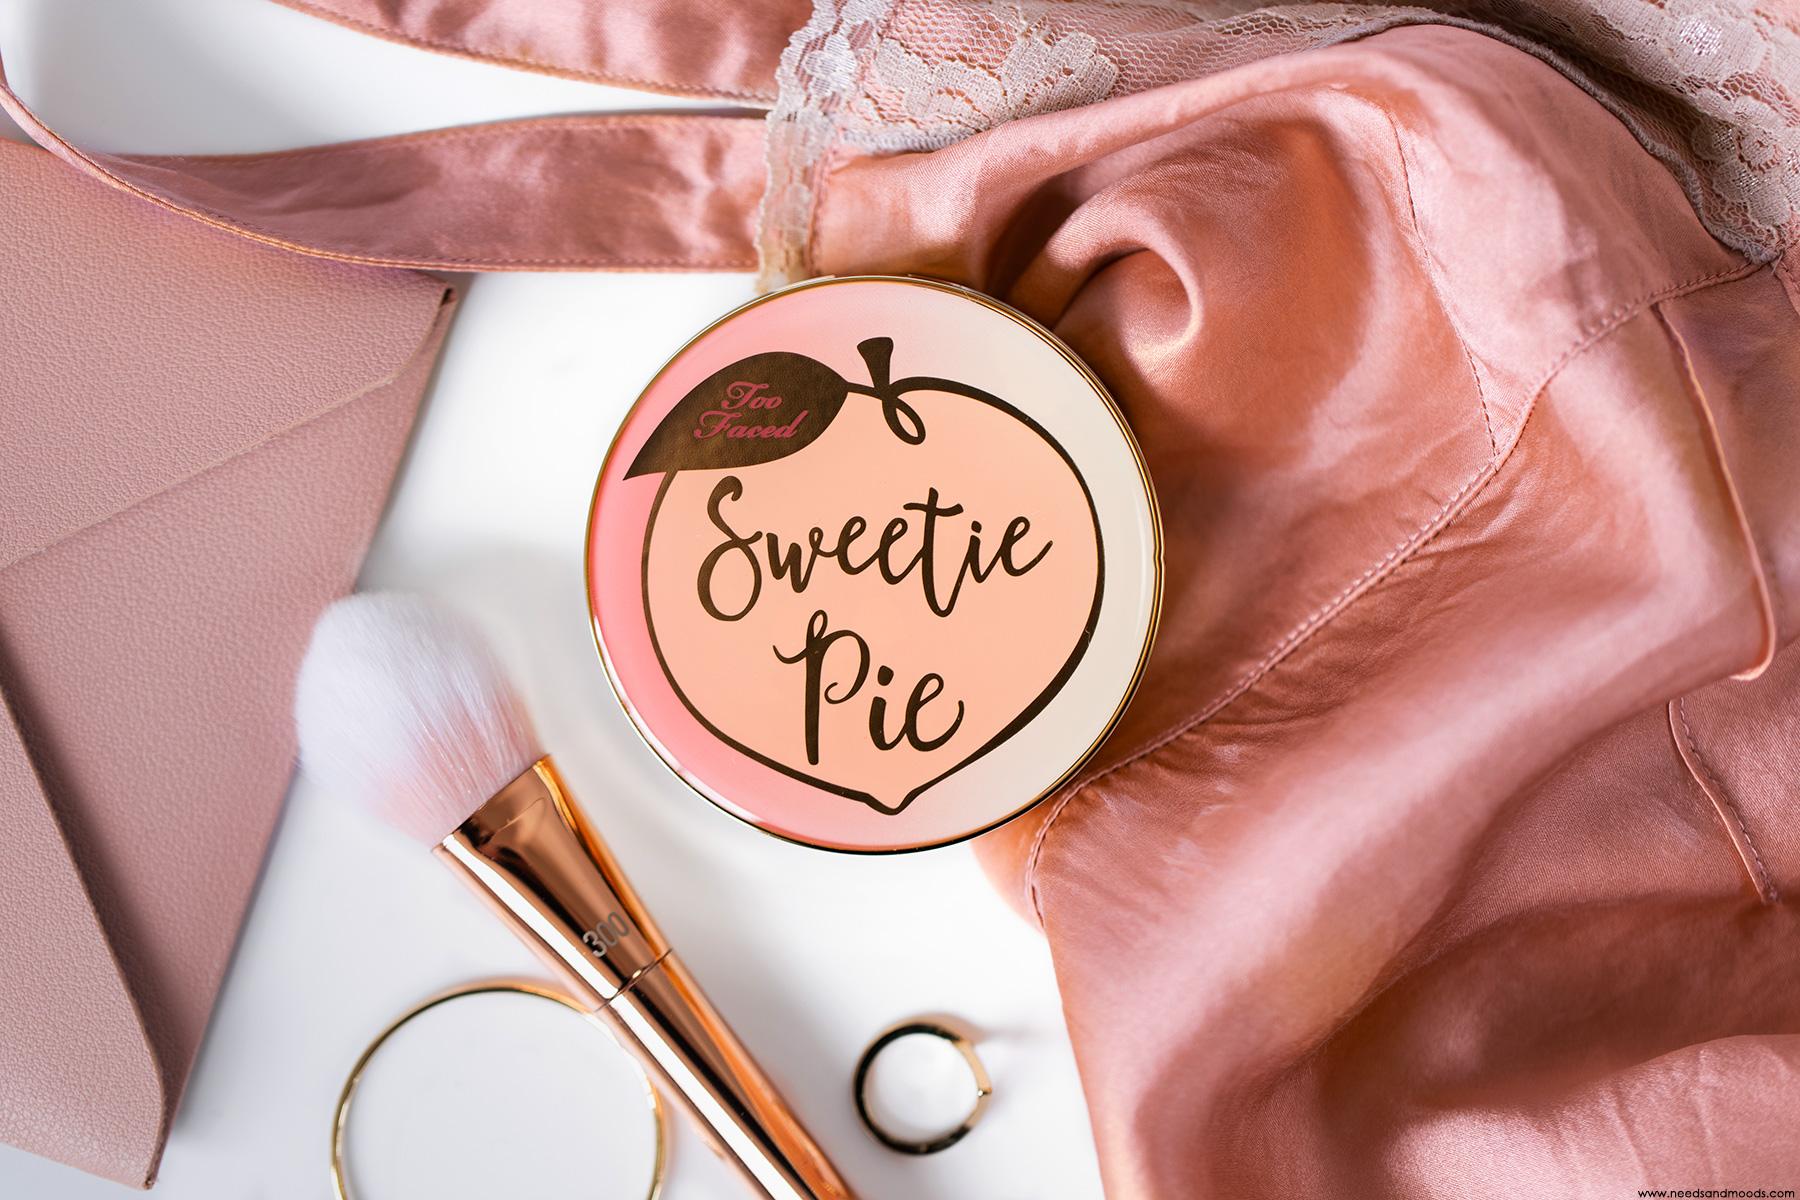 sweetie pie too faced